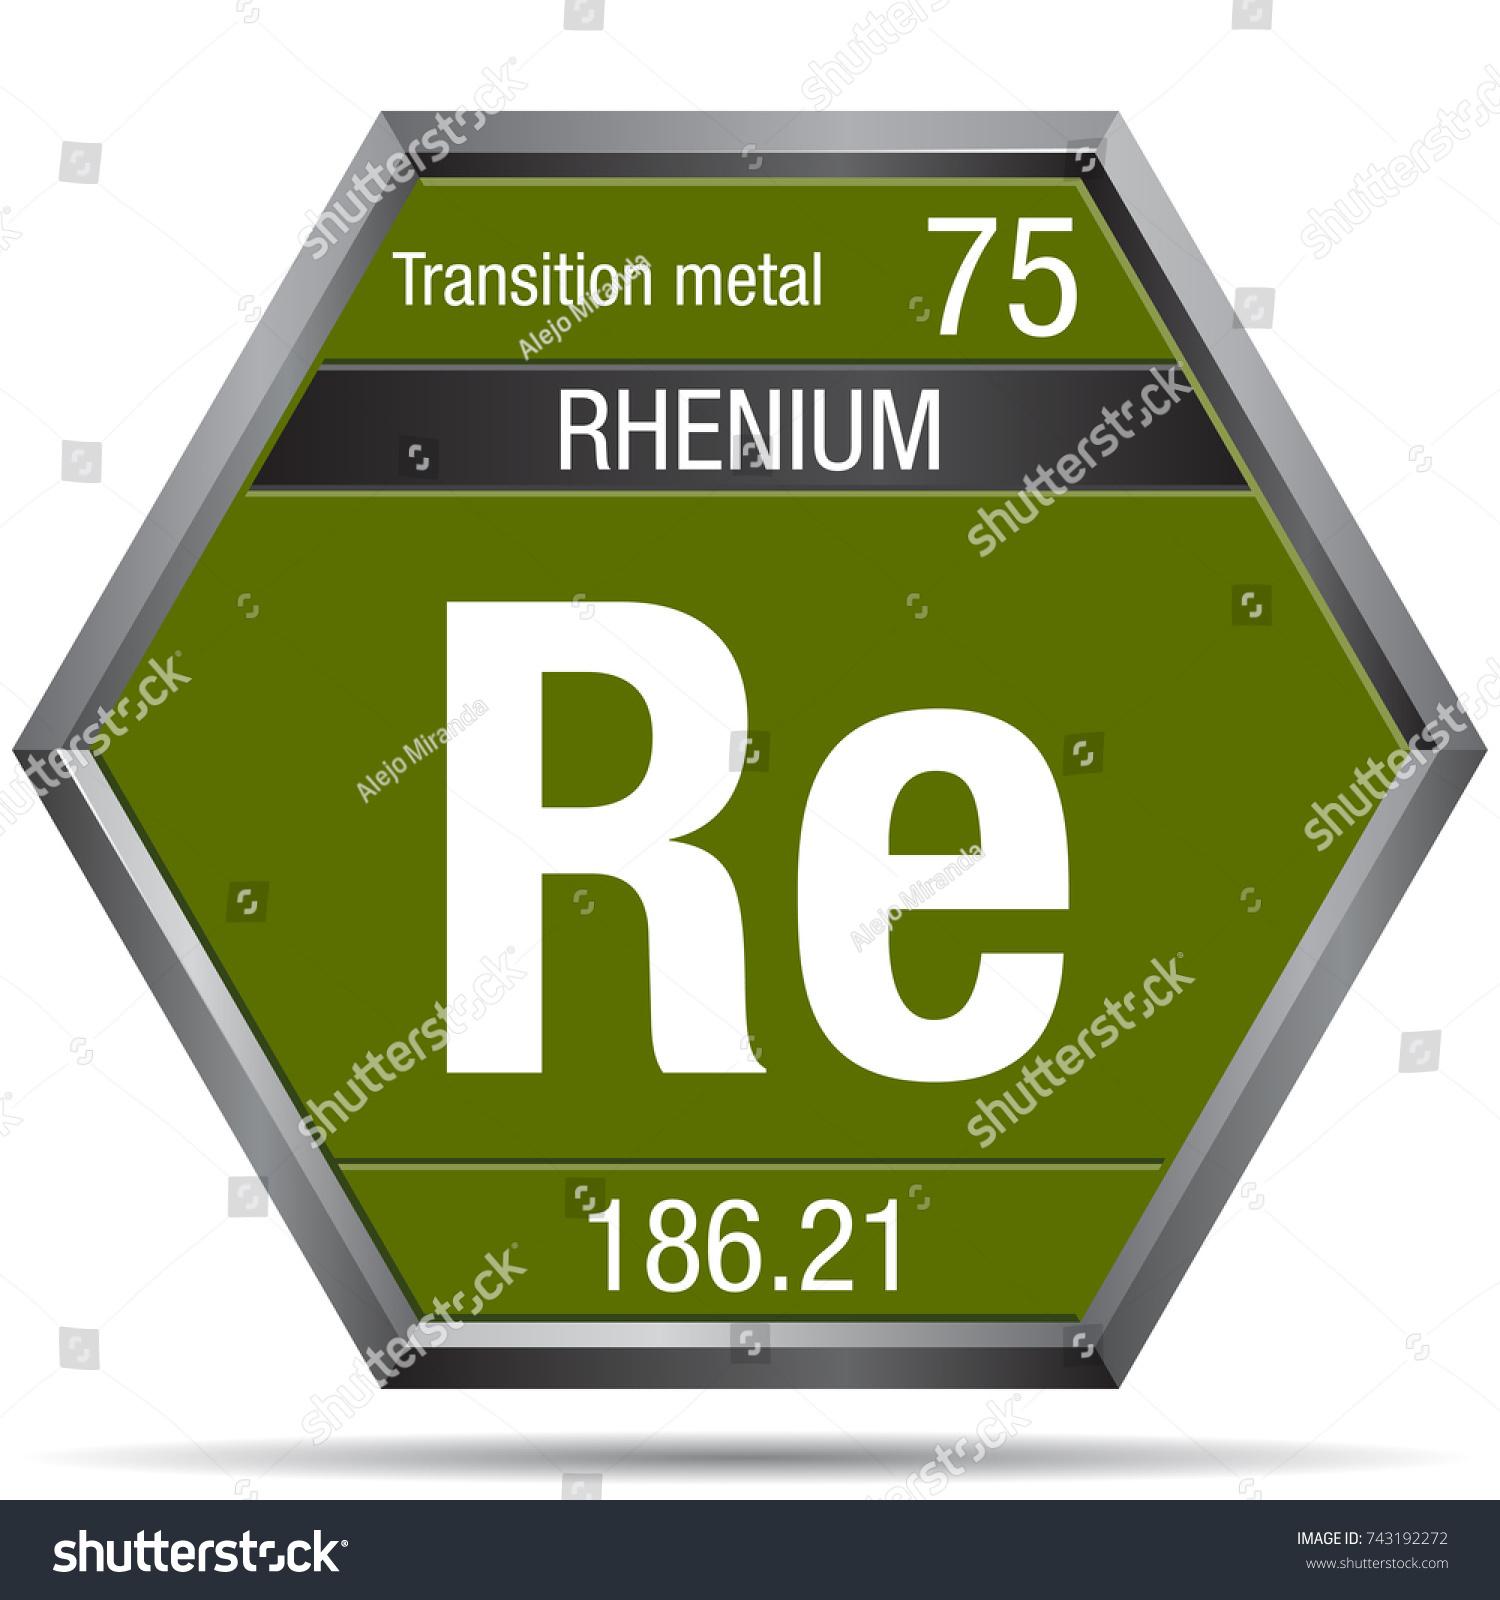 Rhenium symbol form hexagon metallic frame stock vector 743192272 rhenium symbol in the form of a hexagon with a metallic frame element number 75 gamestrikefo Choice Image